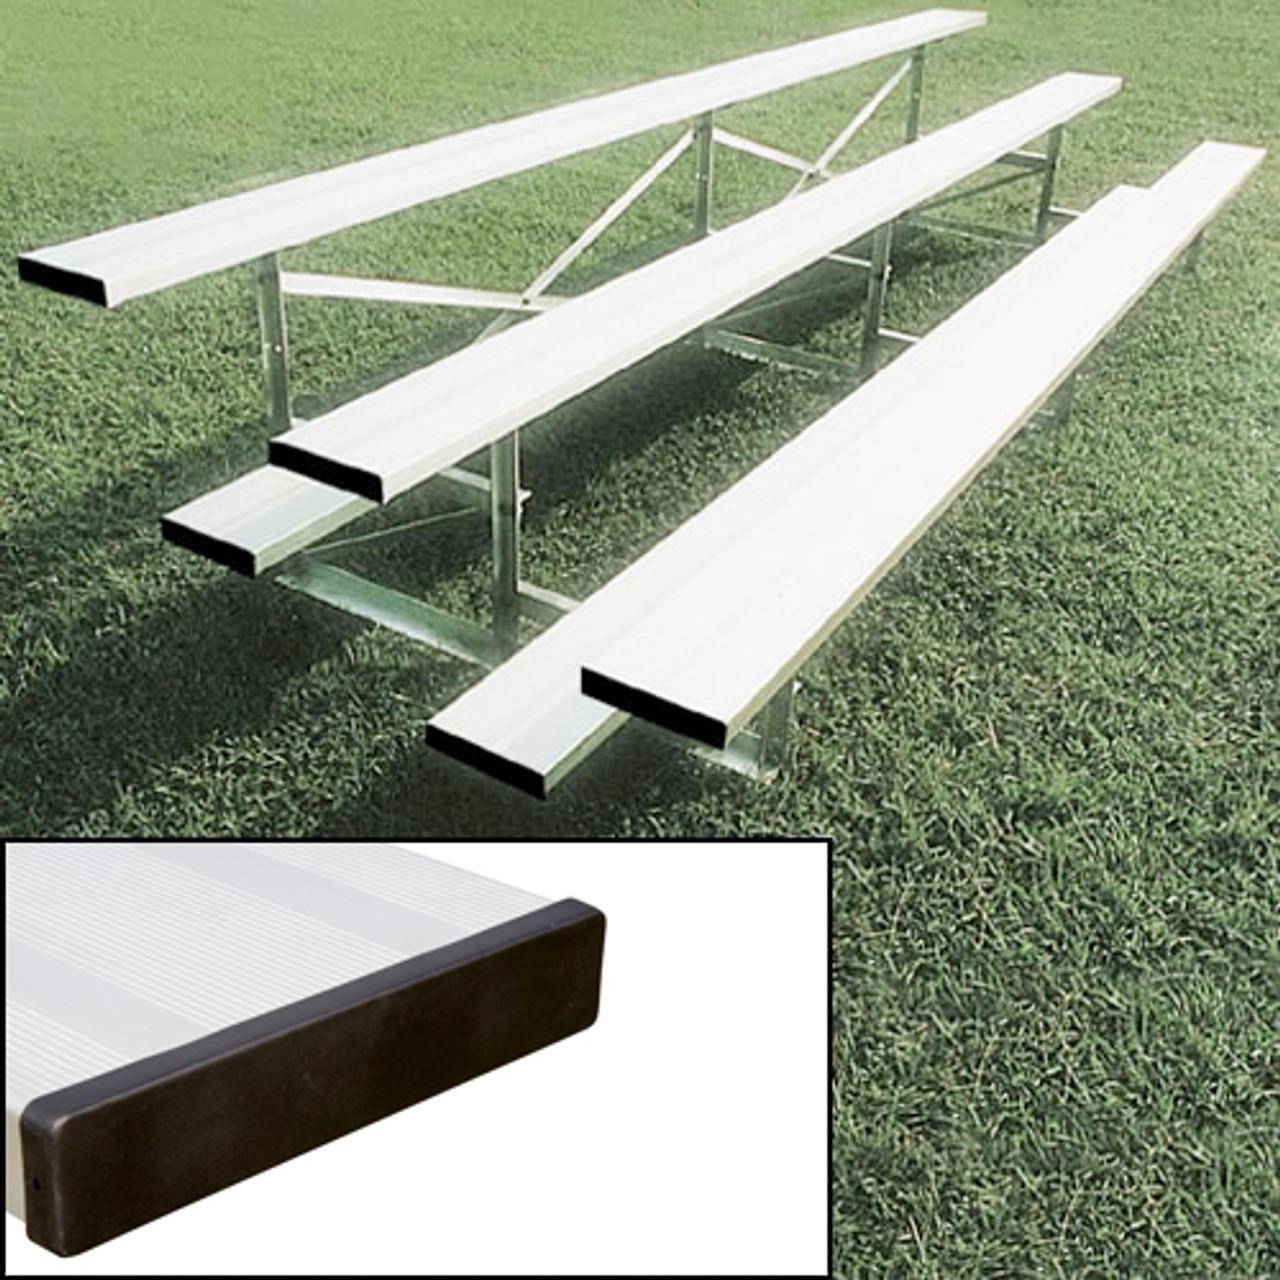 2 Row 15' Preferred Aluminum Bleacher (seats 20)